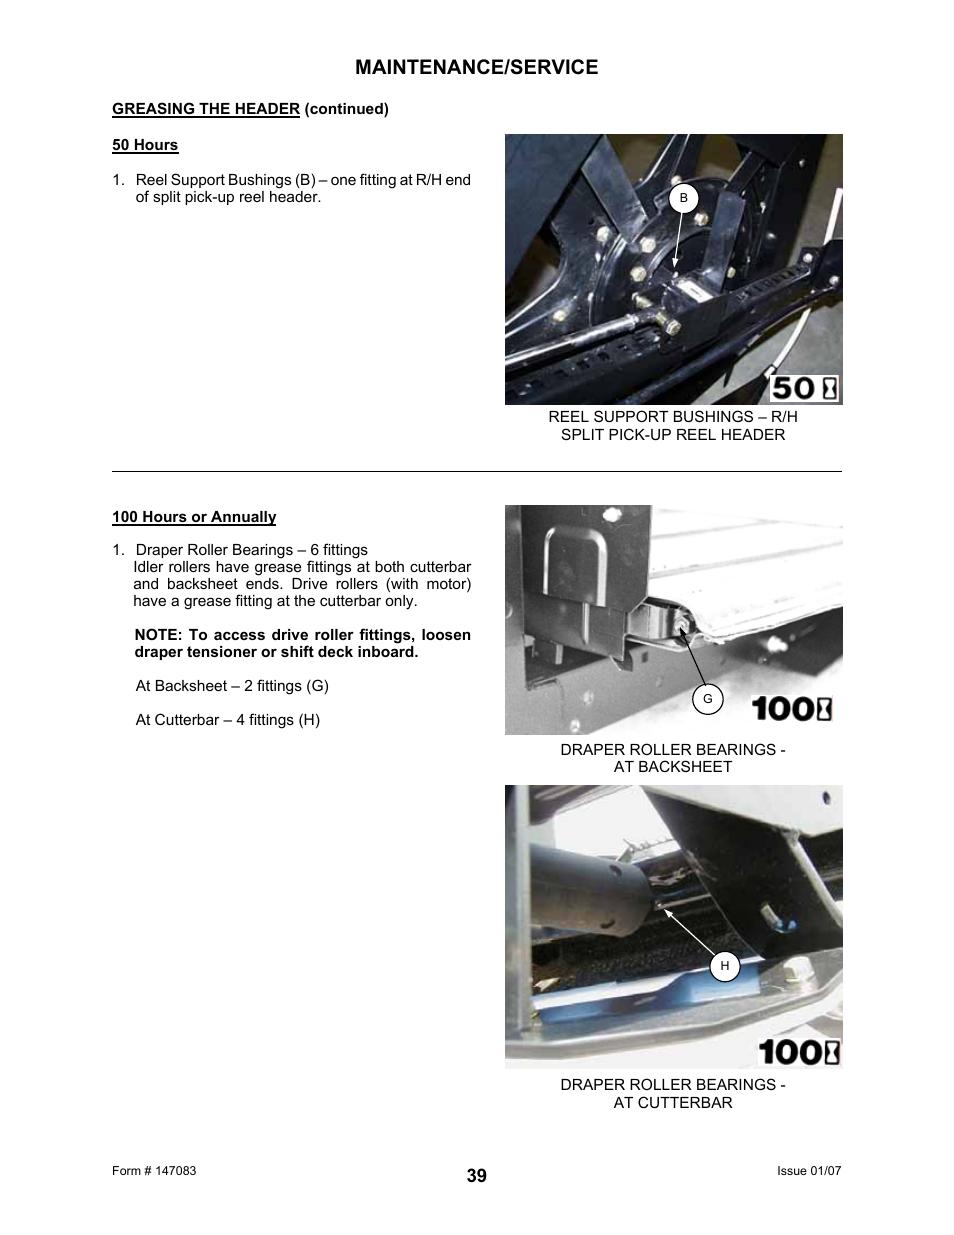 Maintenance/service | MacDon 974 FlexDraper User Manual